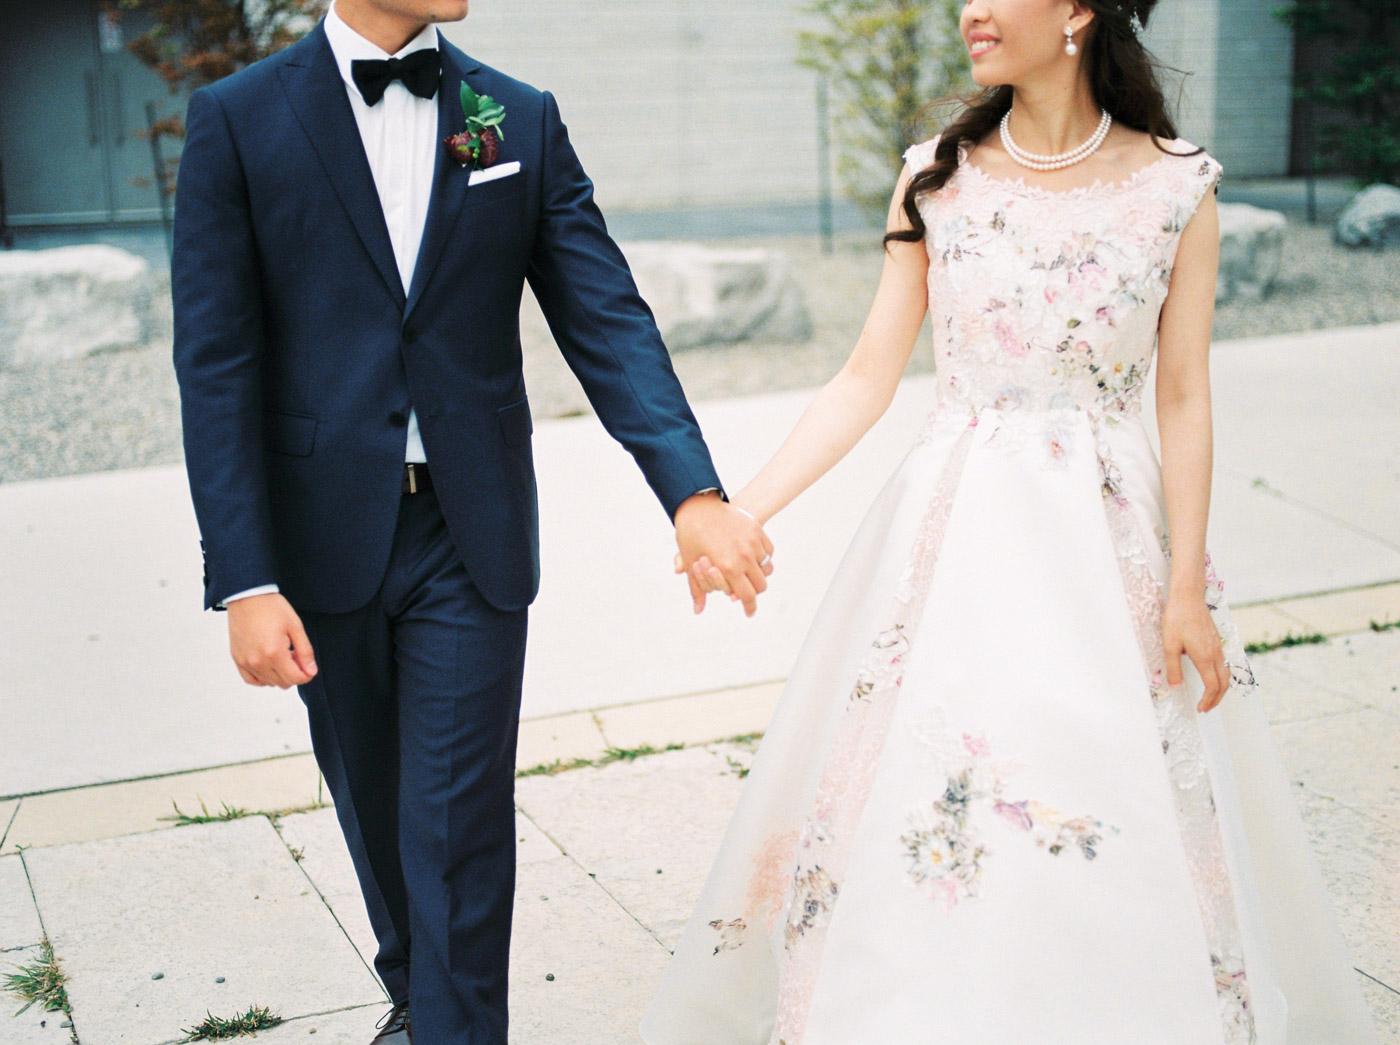 toronto_wedding_photographer_documentary_fine_art_photography-37.jpg